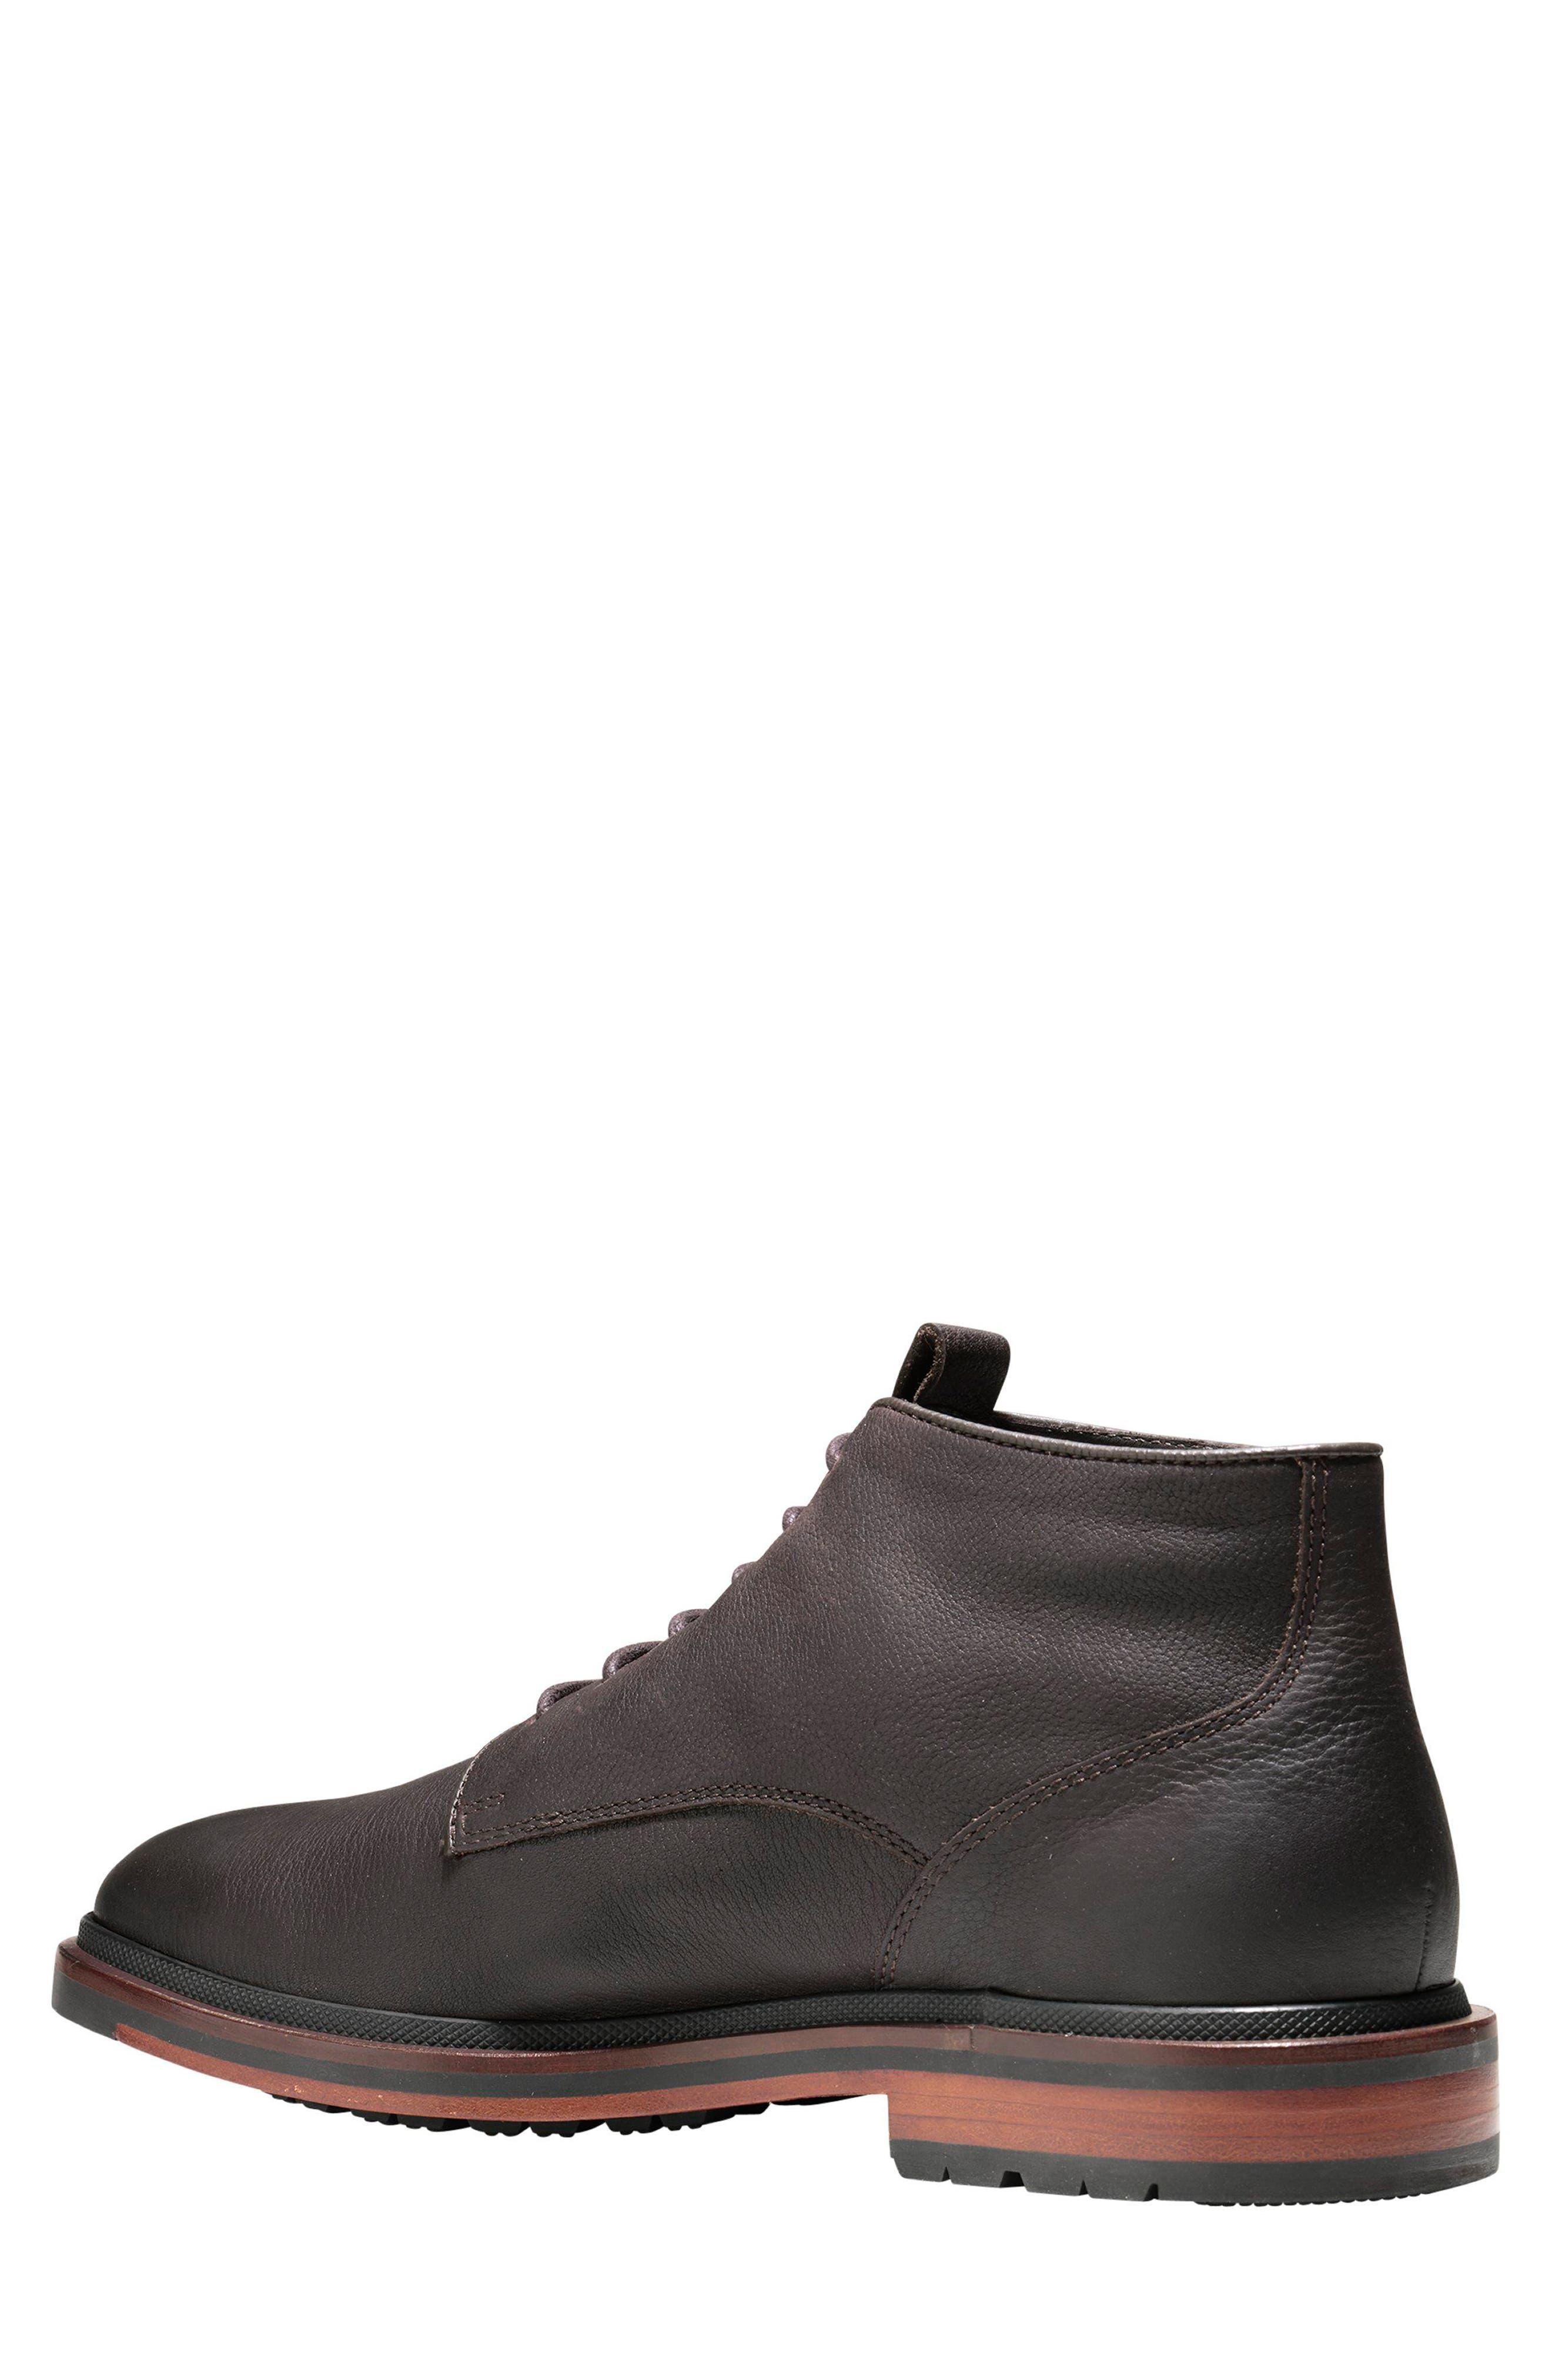 'Cranston' Water Resistant Chukka Boot,                             Alternate thumbnail 2, color,                             205